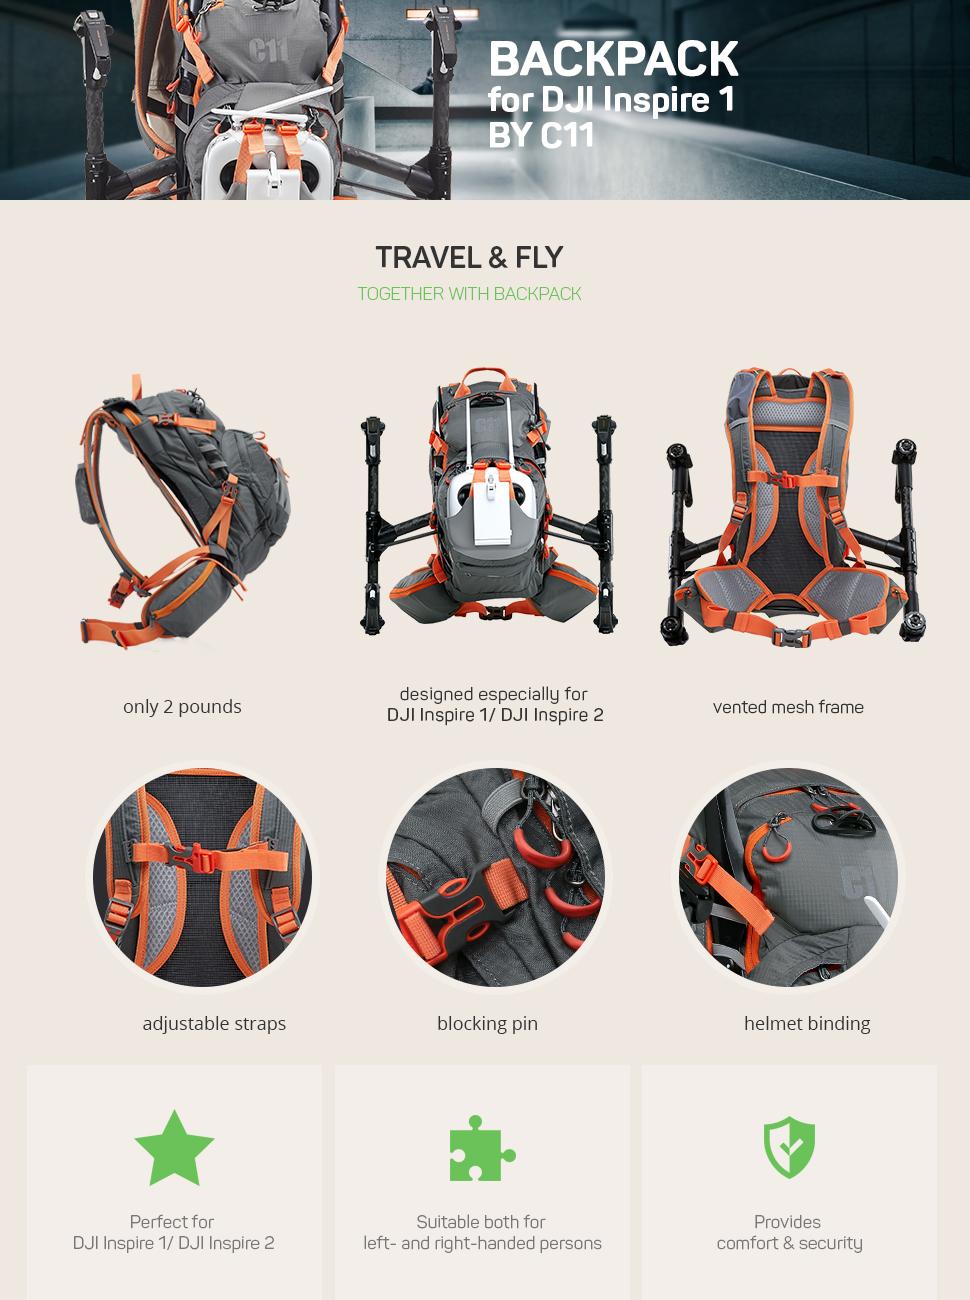 amazon com backpack for dji inspire 1 dji inspire 2 grey by